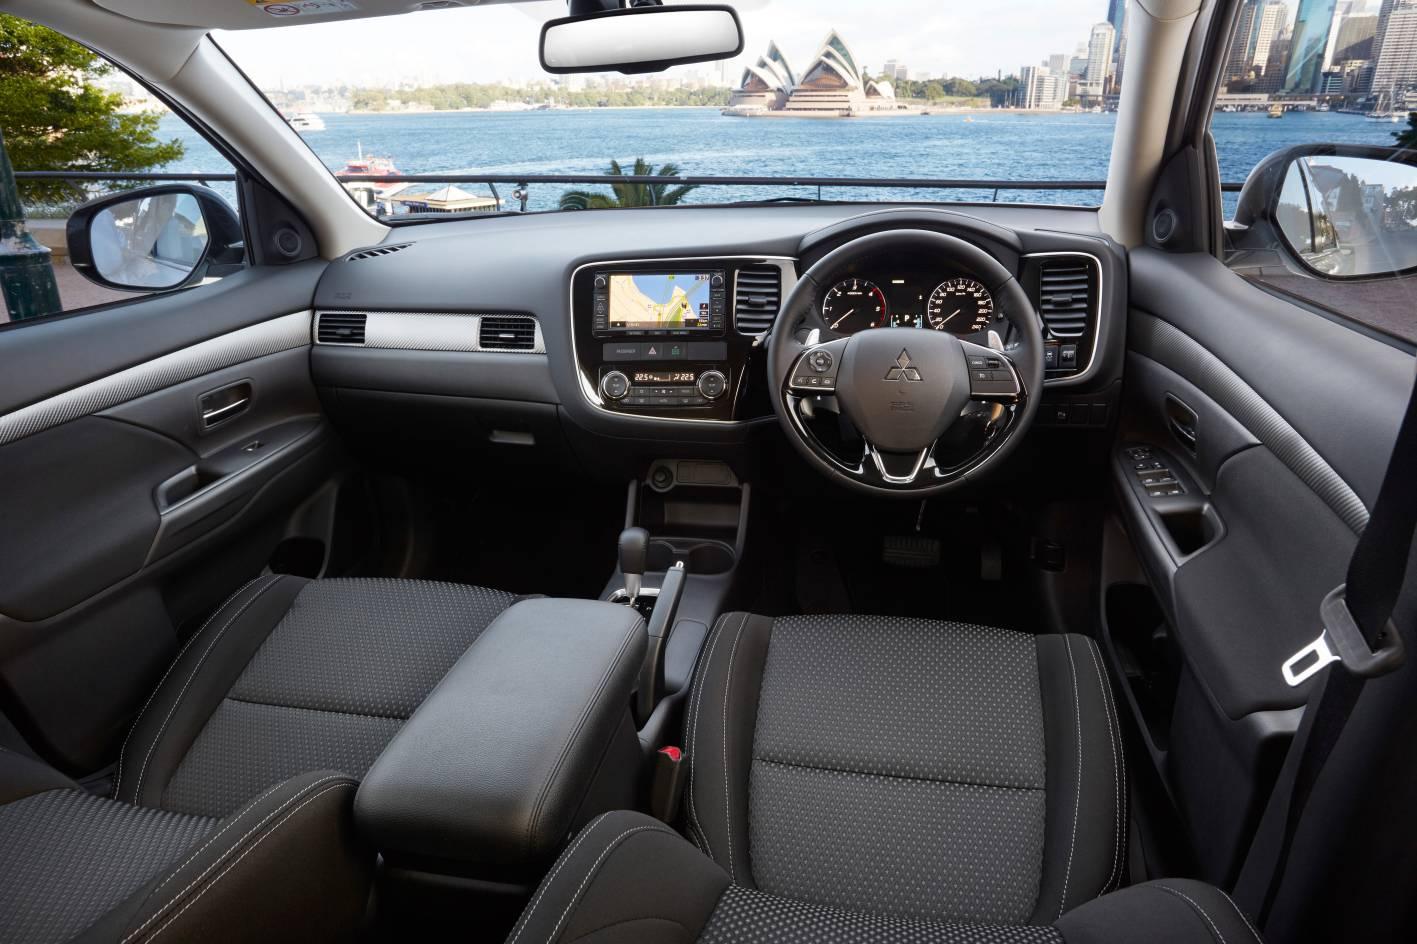 2016 Mitsubishi Outlander interior - ForceGT.com